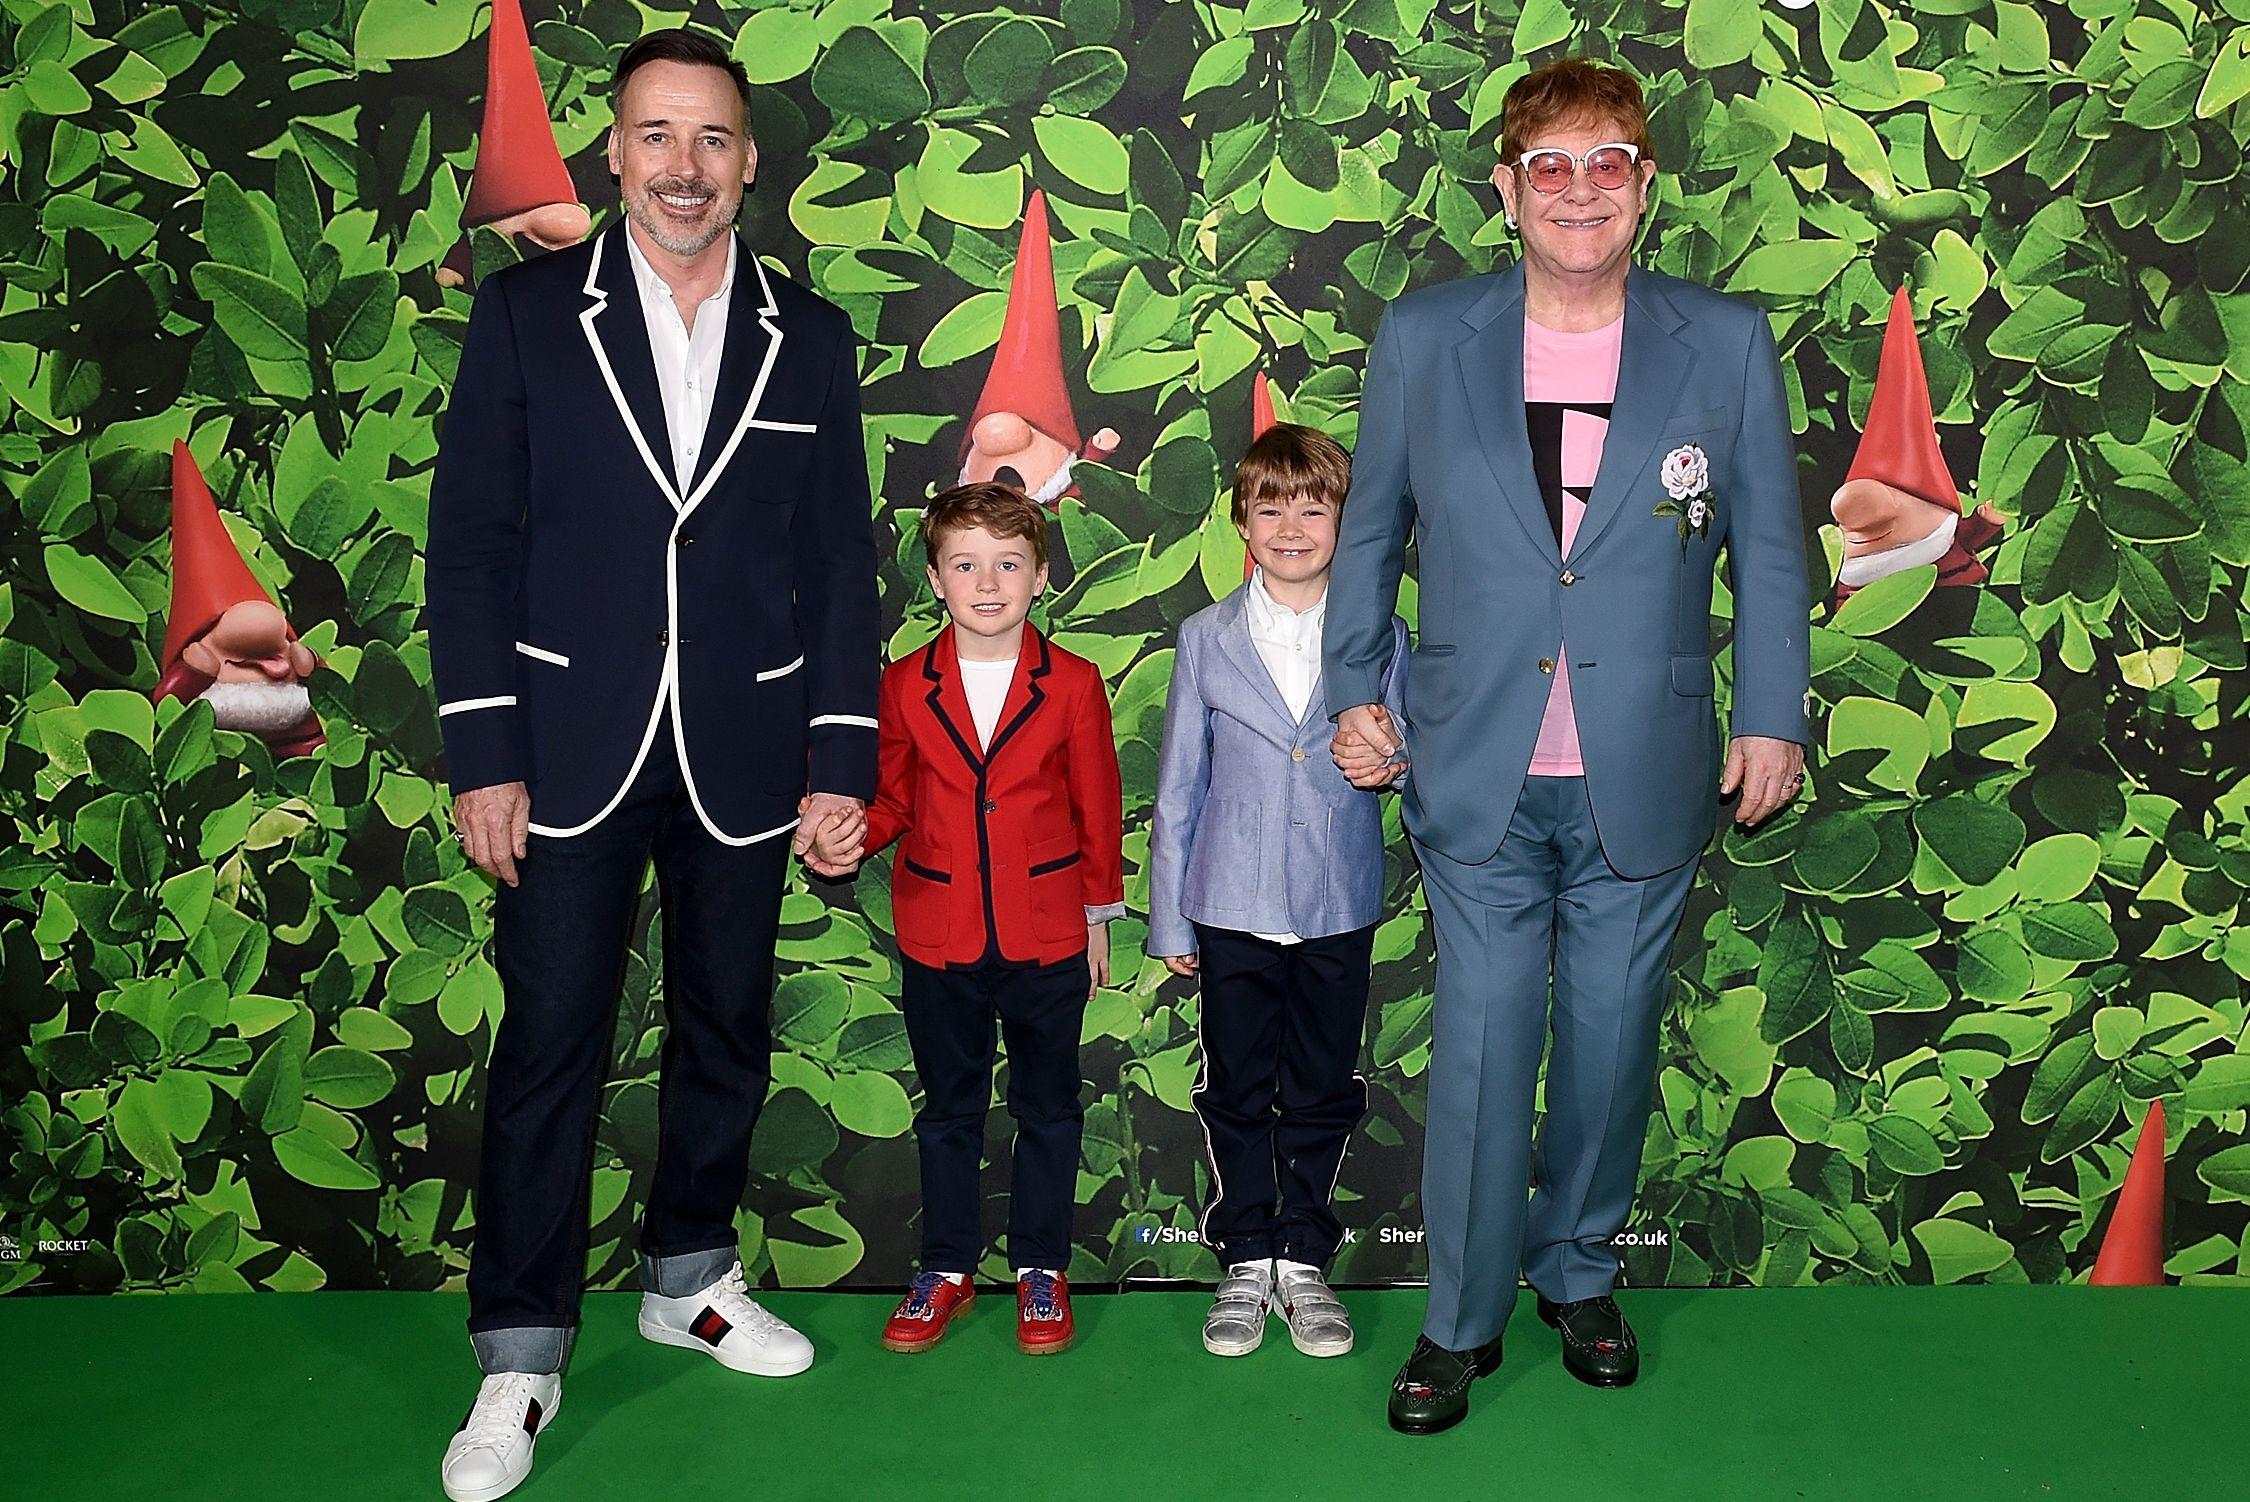 'Sherlock Gnomes' London Family Gala hosted by Sir Elton John and David Furnish